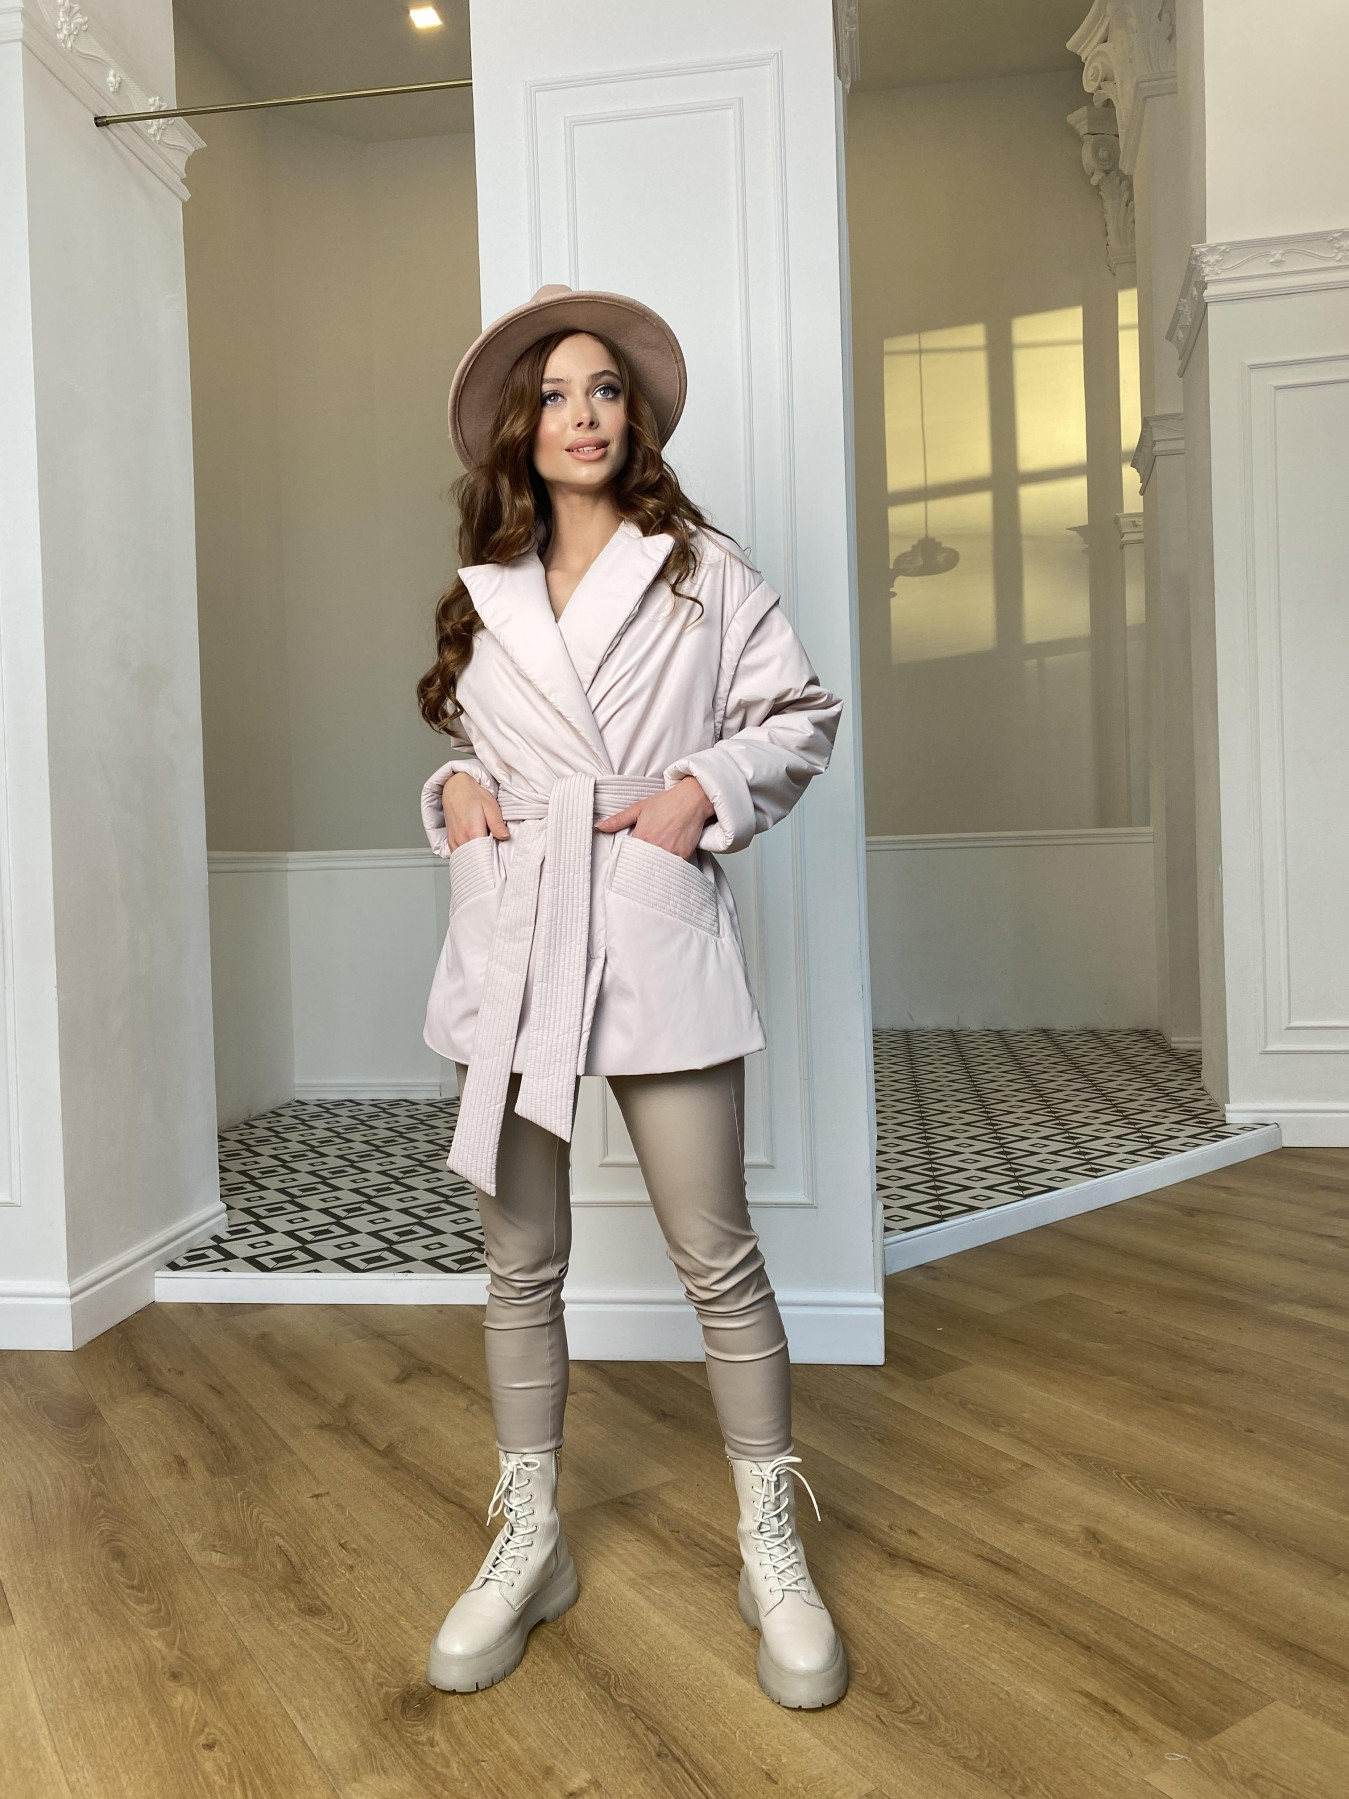 Форбс плащевка Ammy куртка 10817 АРТ. 47298 Цвет: Молоко - фото 6, интернет магазин tm-modus.ru